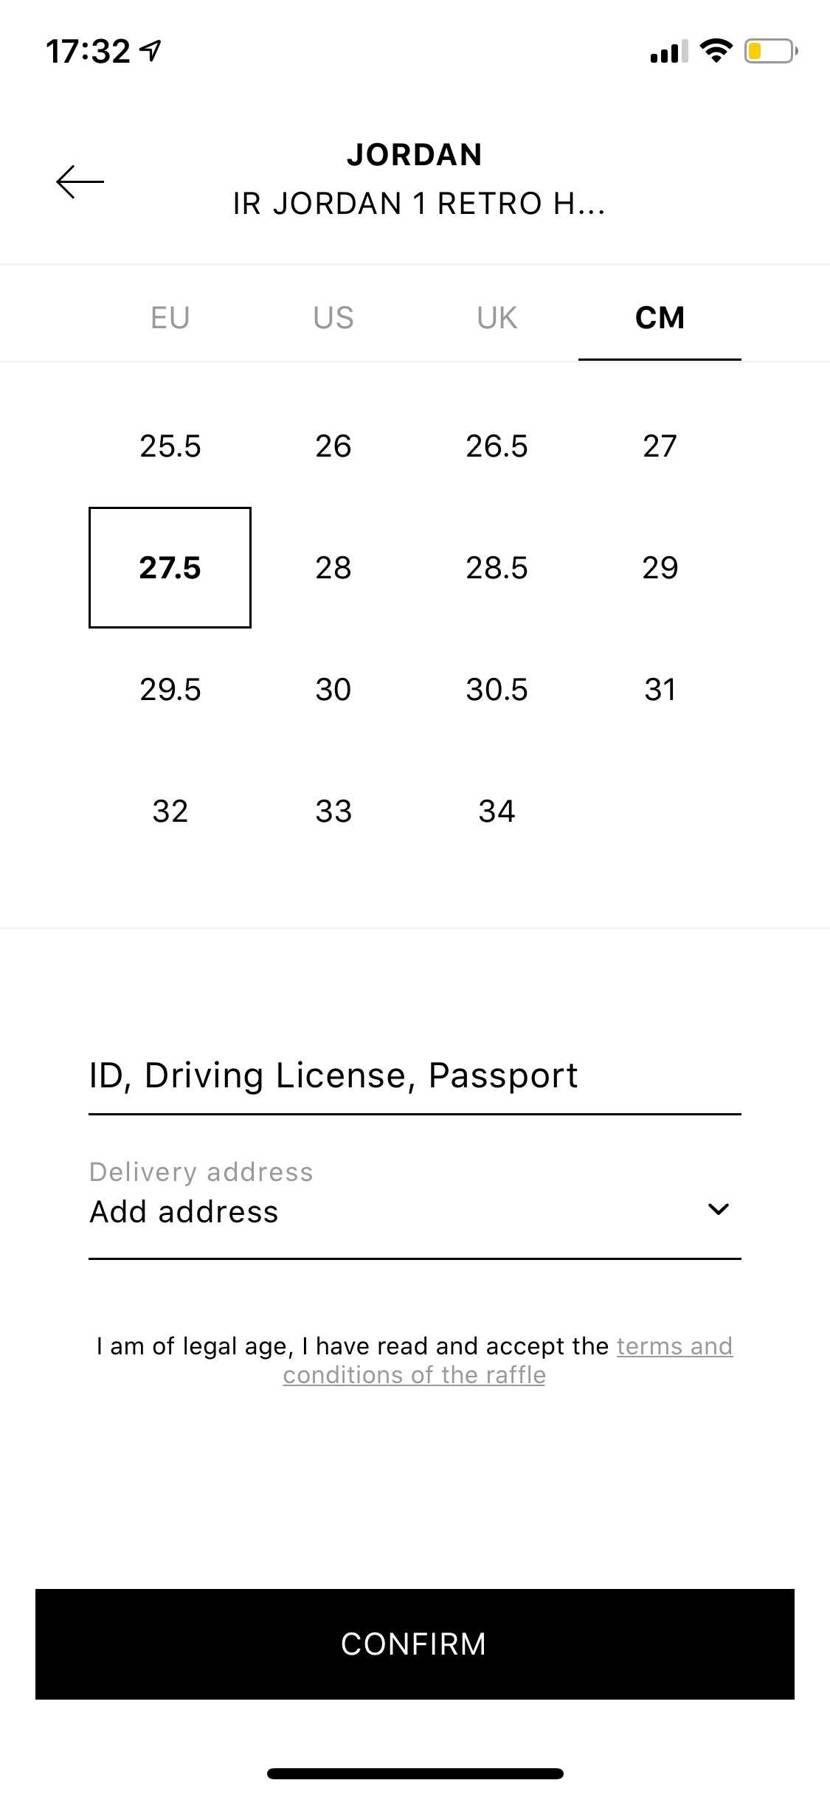 ID,Driving License ,passport  の所って何を書けば良